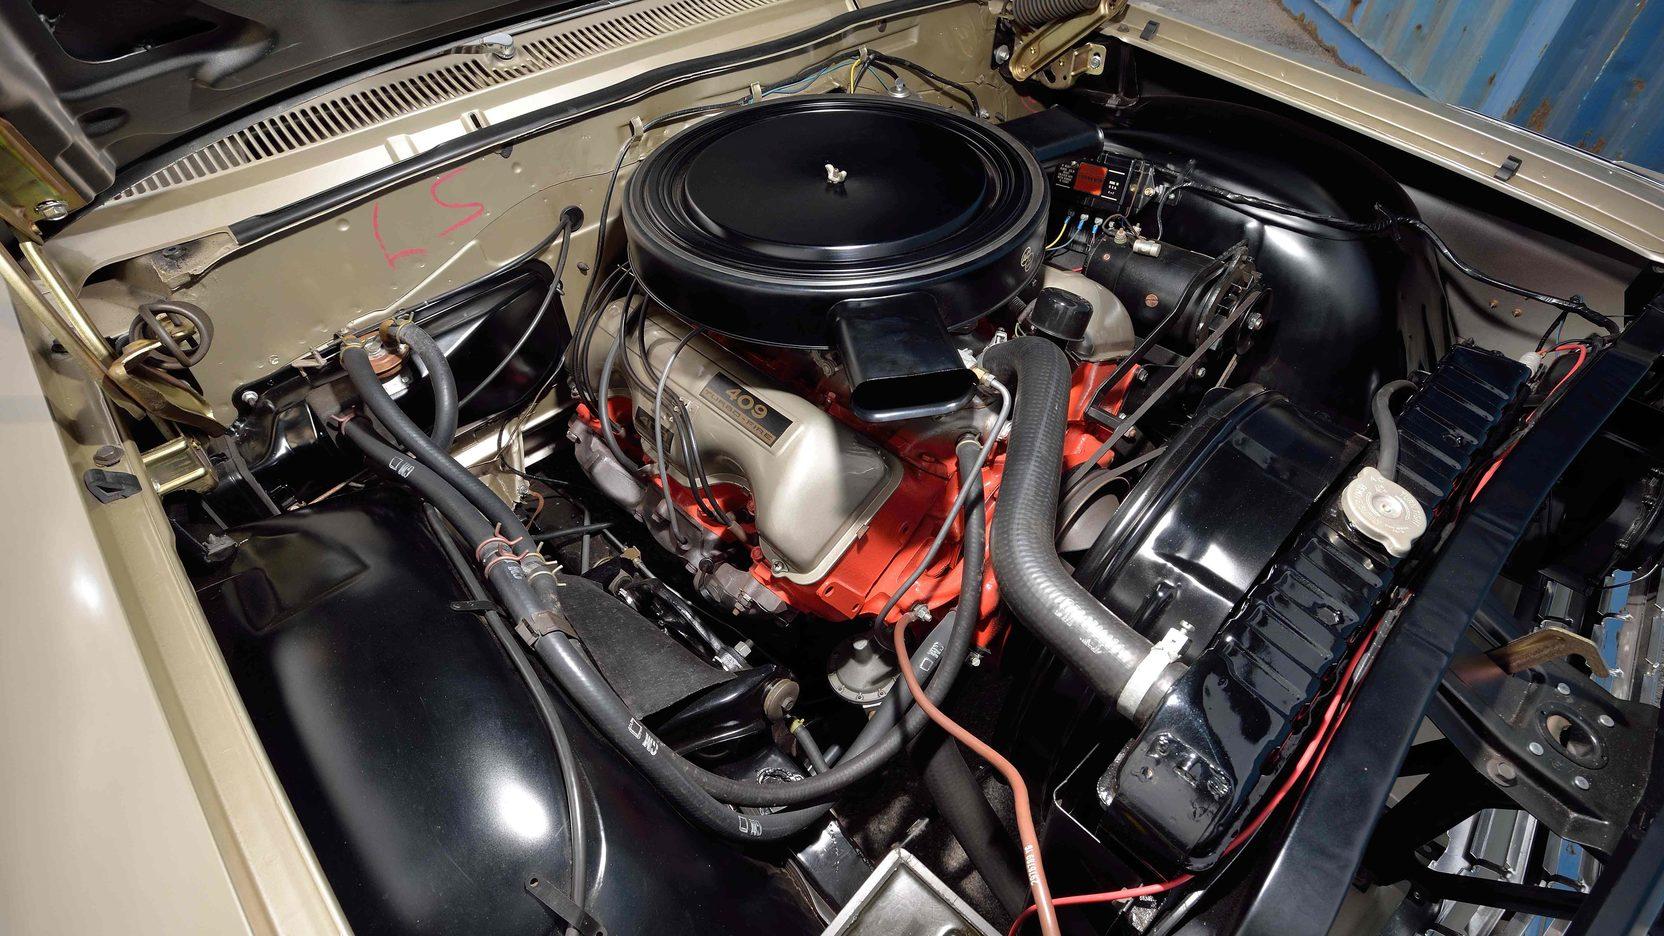 1962 Chevrolet Impala engine